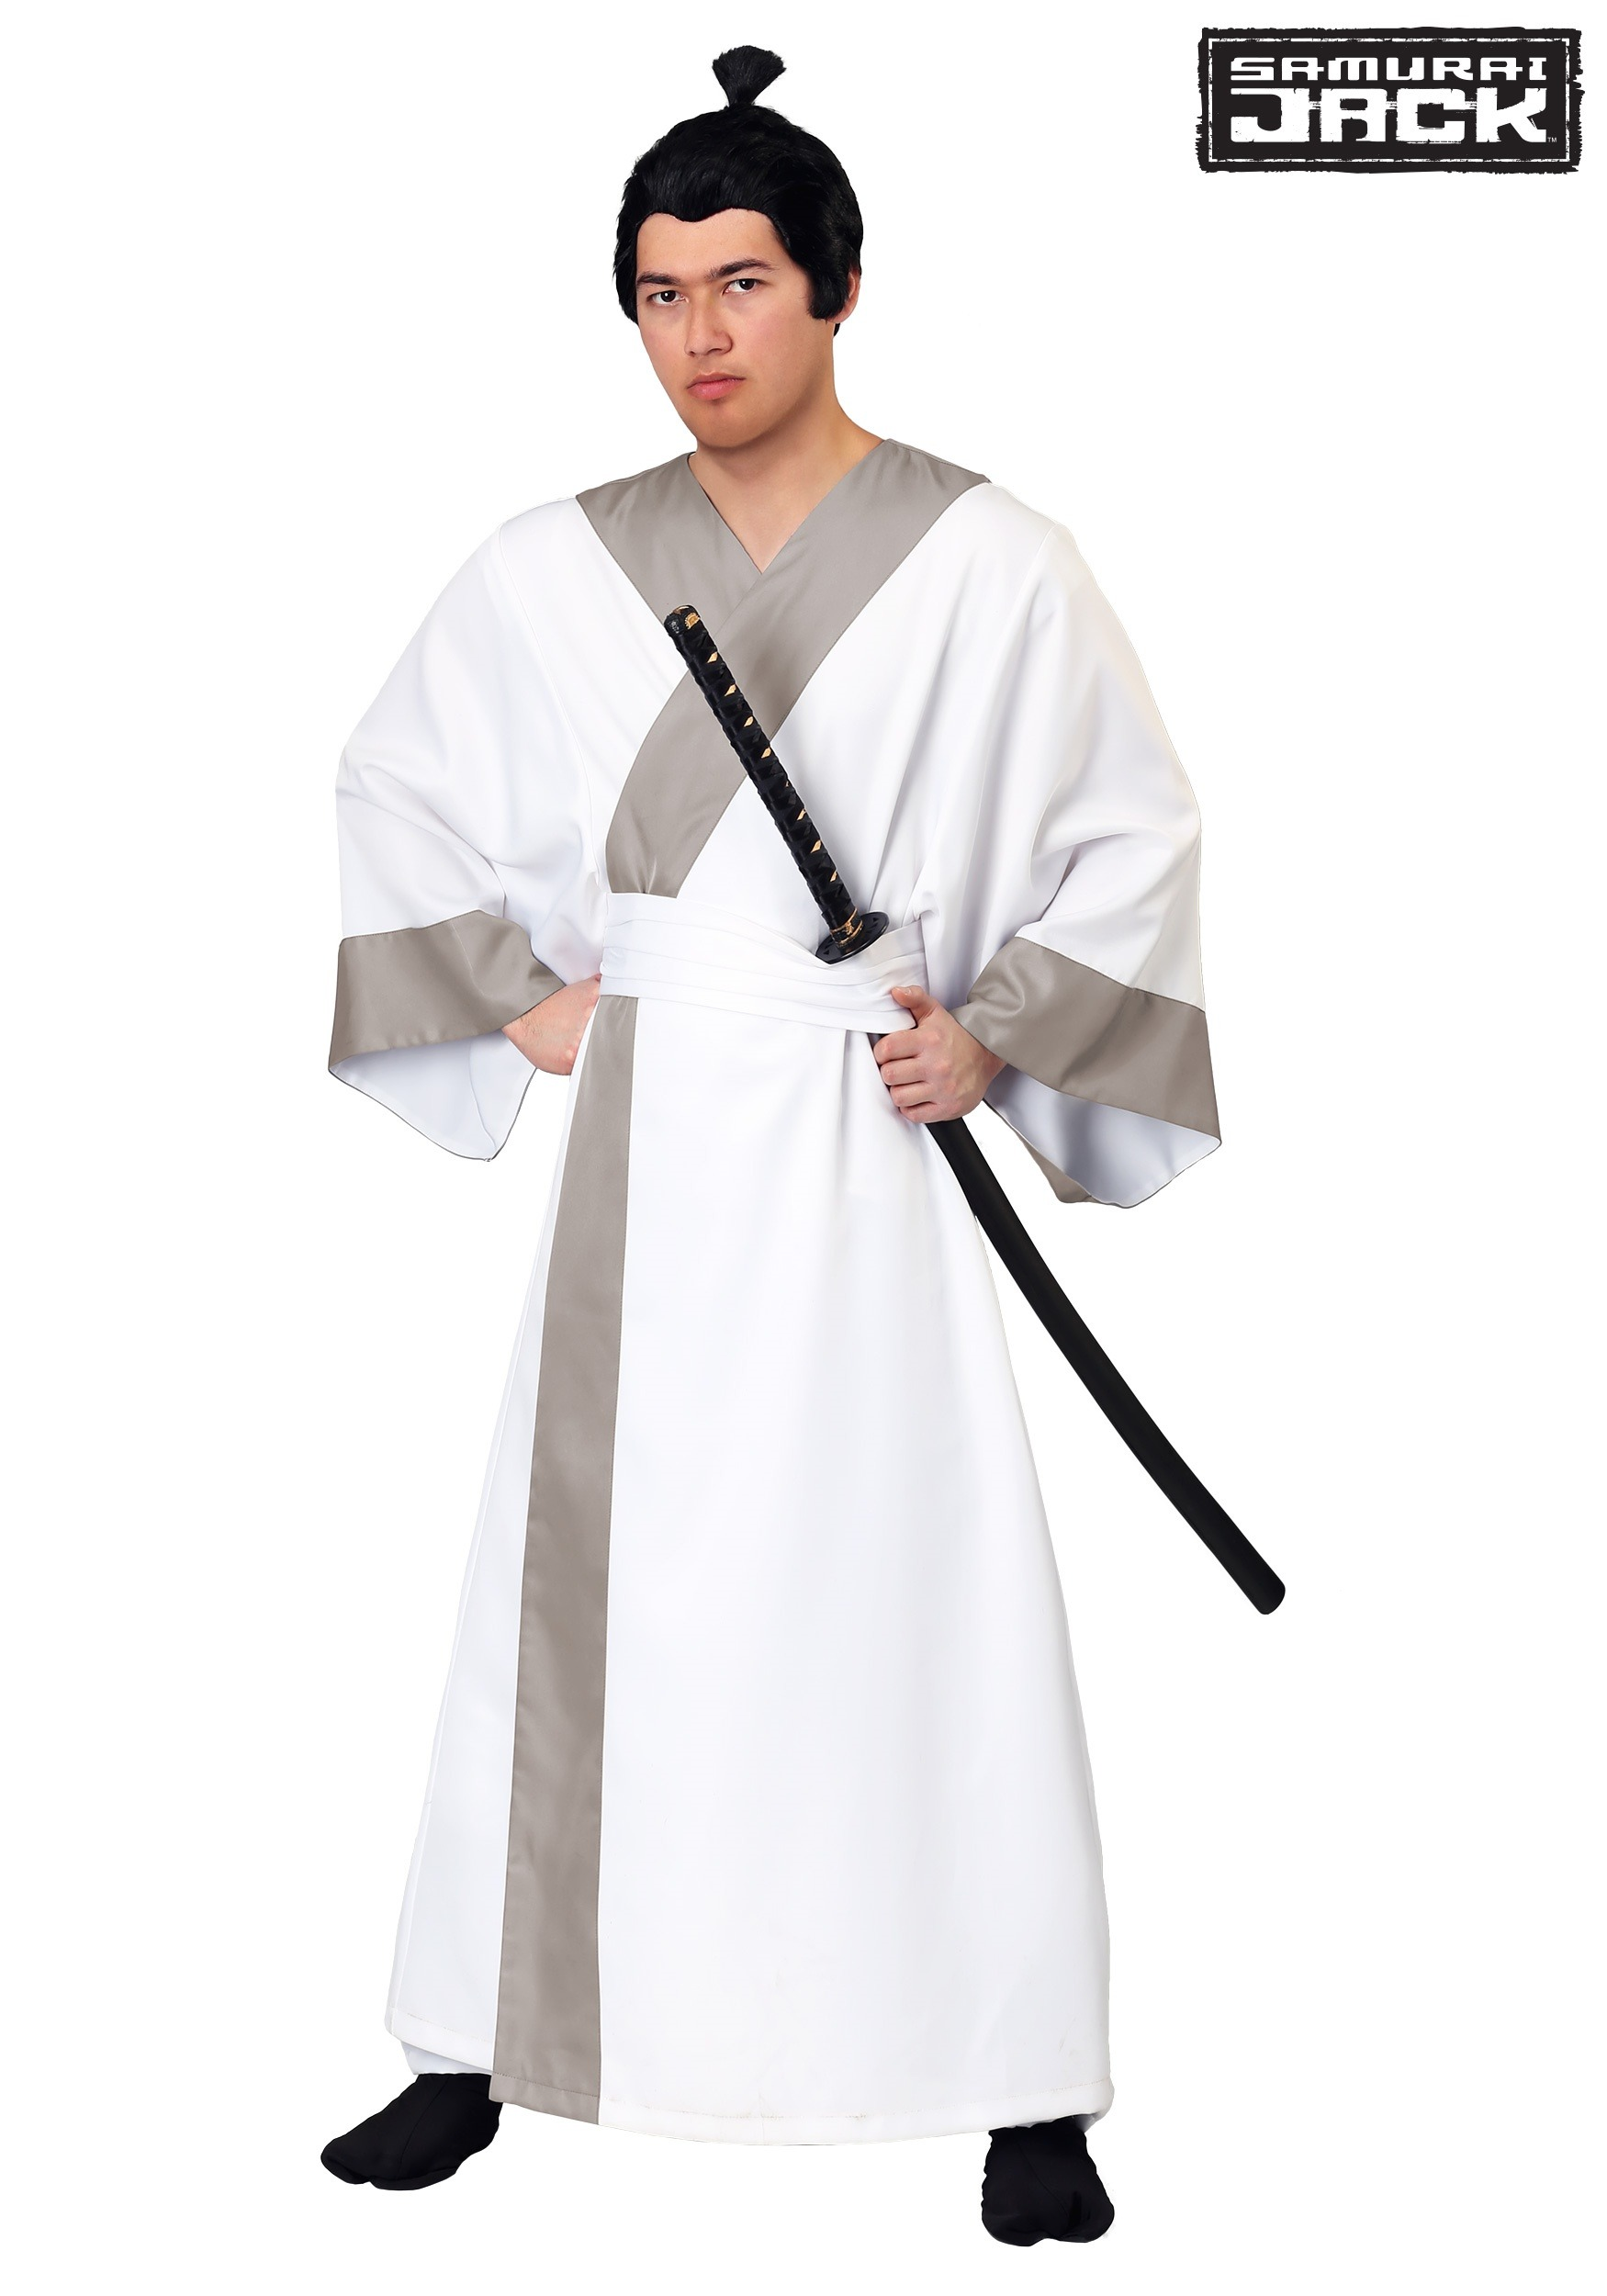 Samurai Jack Halloween Costume